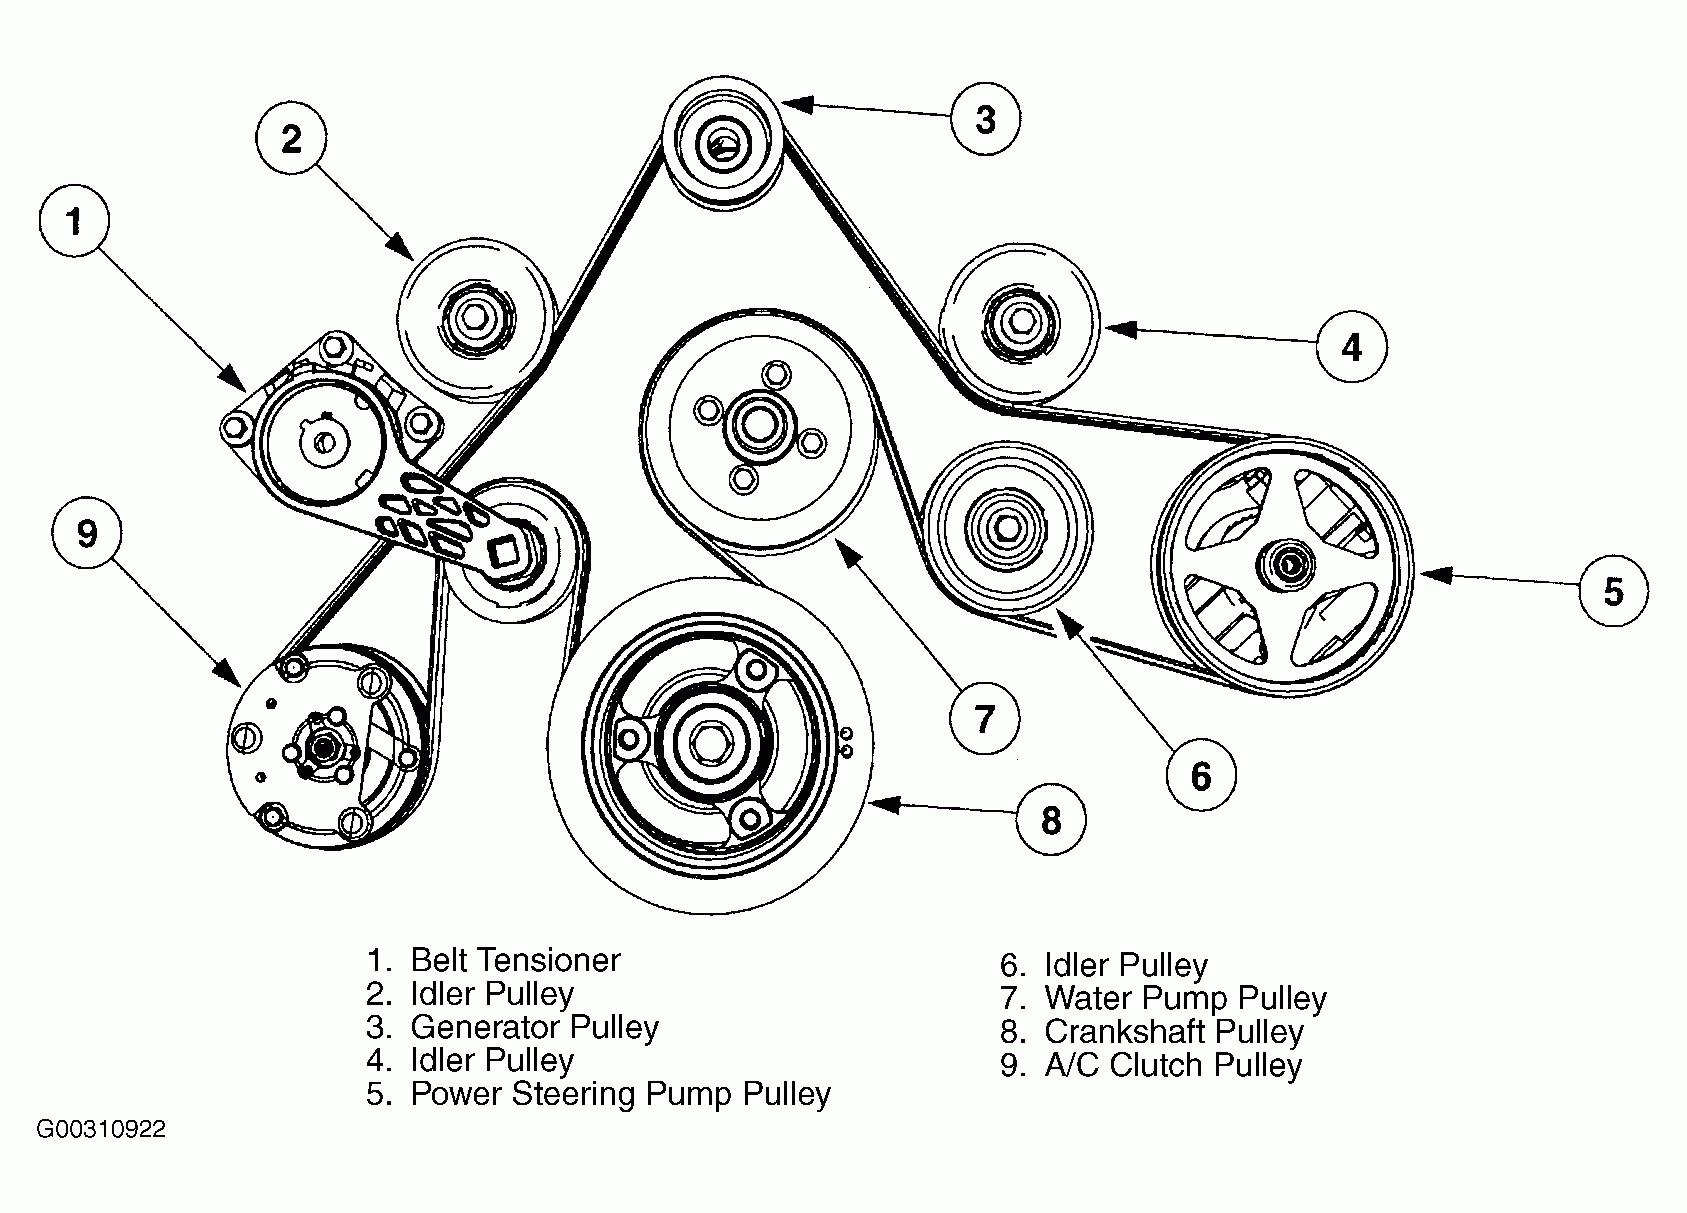 96 jeep cherokee alternator wiring diagram